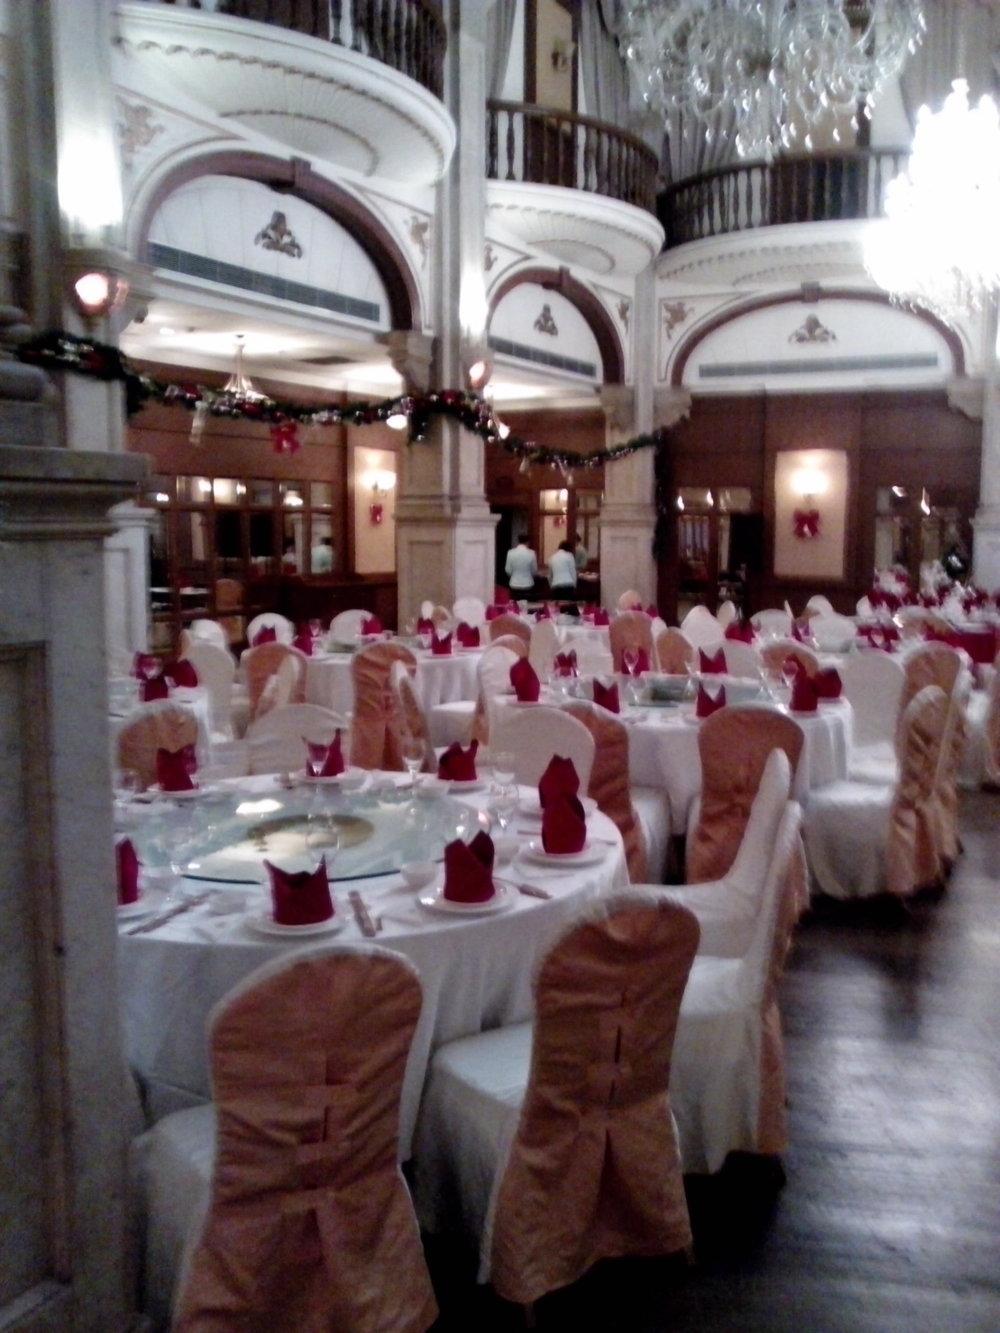 Astor House Hotel ballroom view